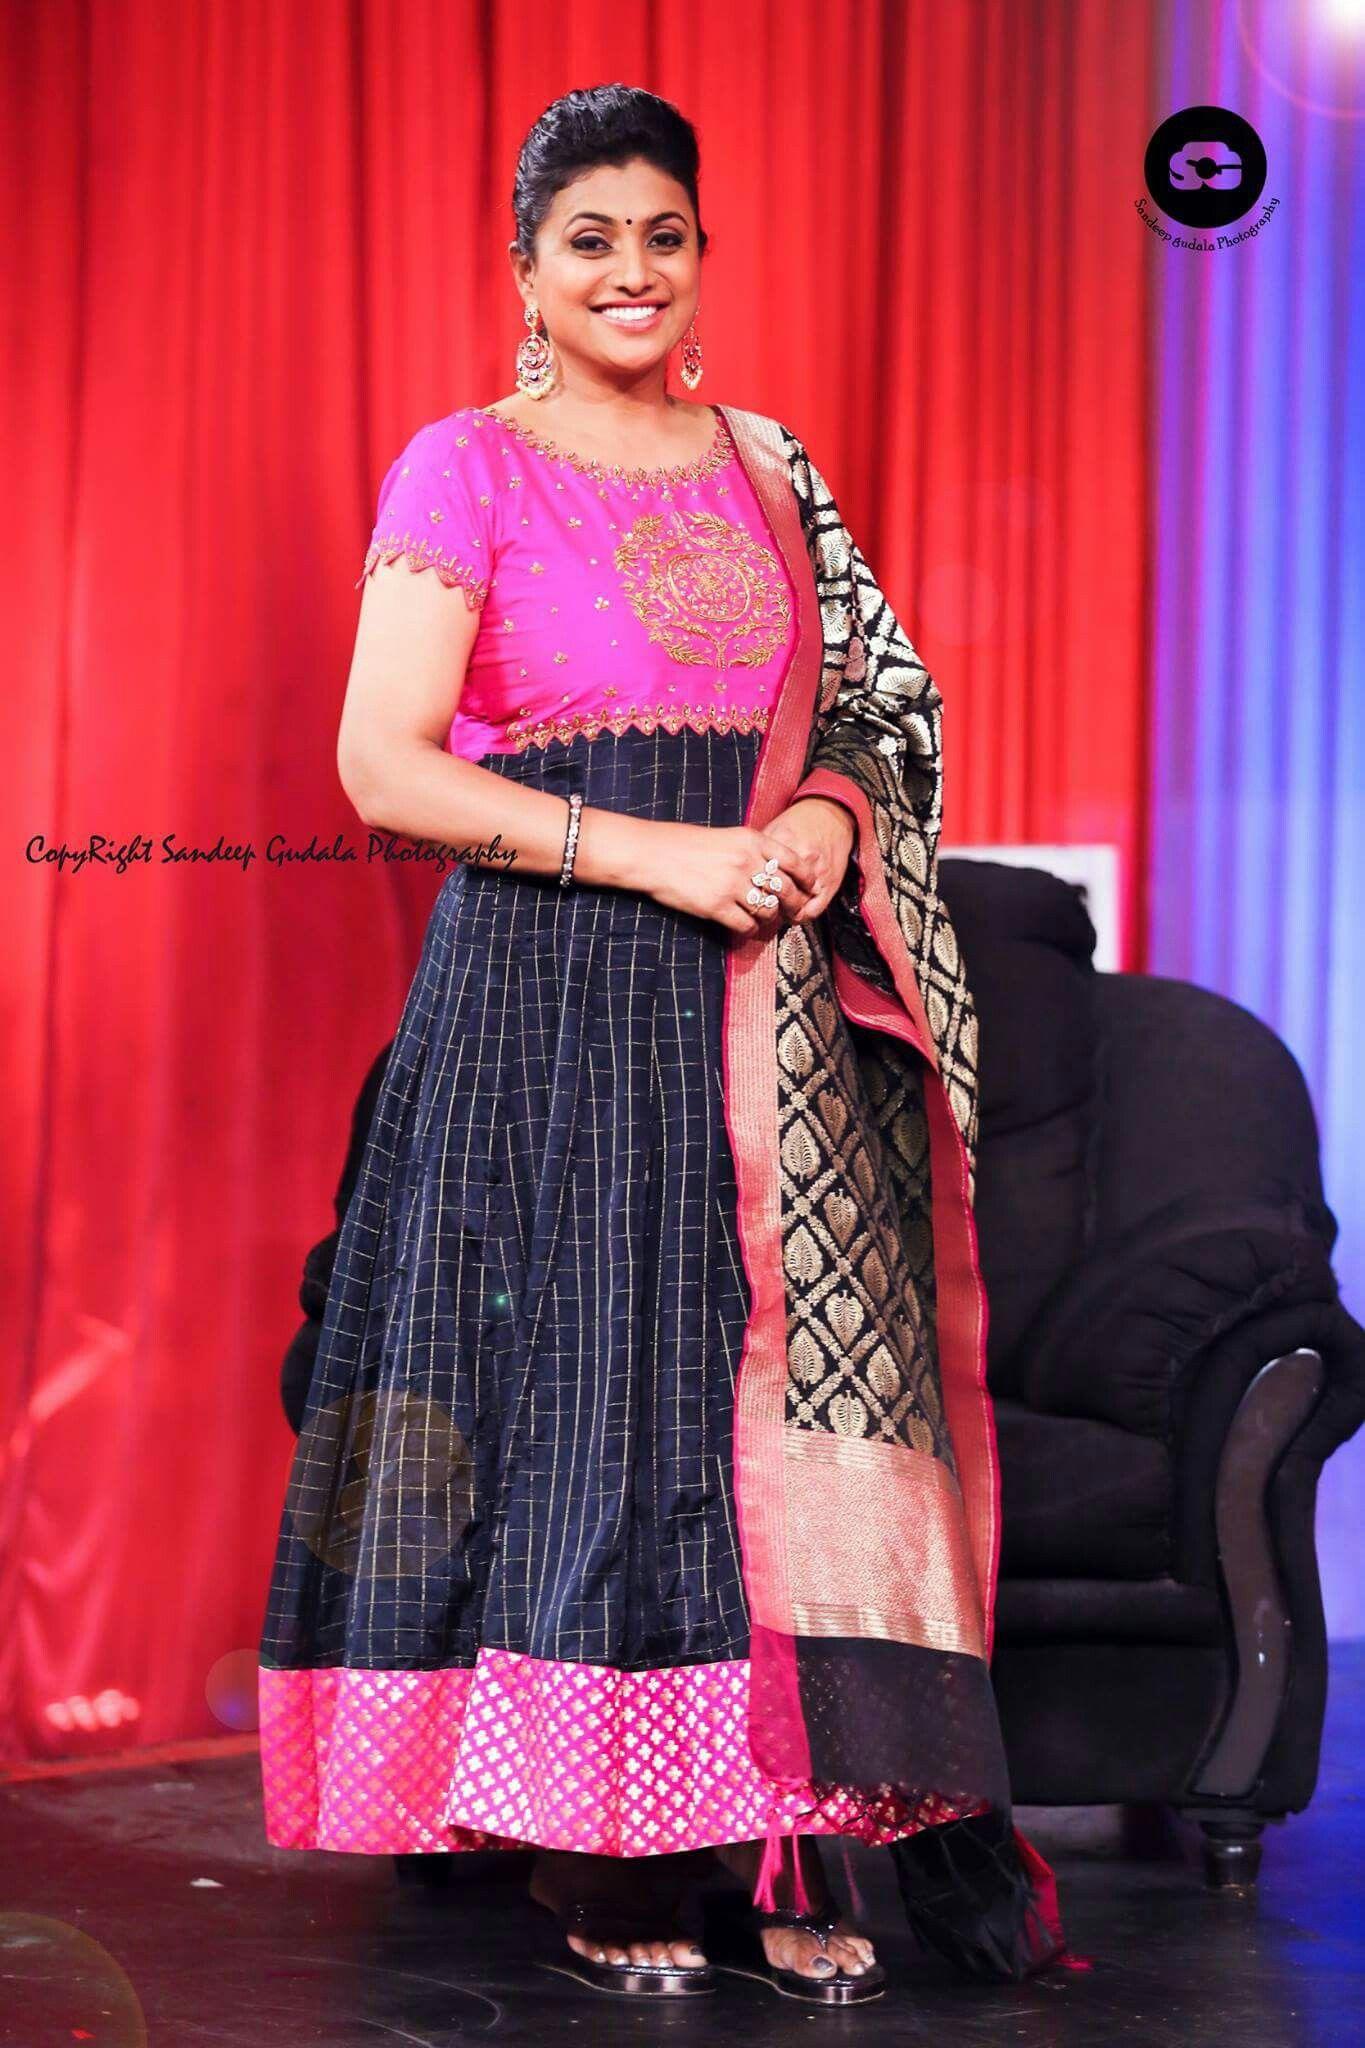 Pin by chaitanya thalluri on dress dision in pinterest